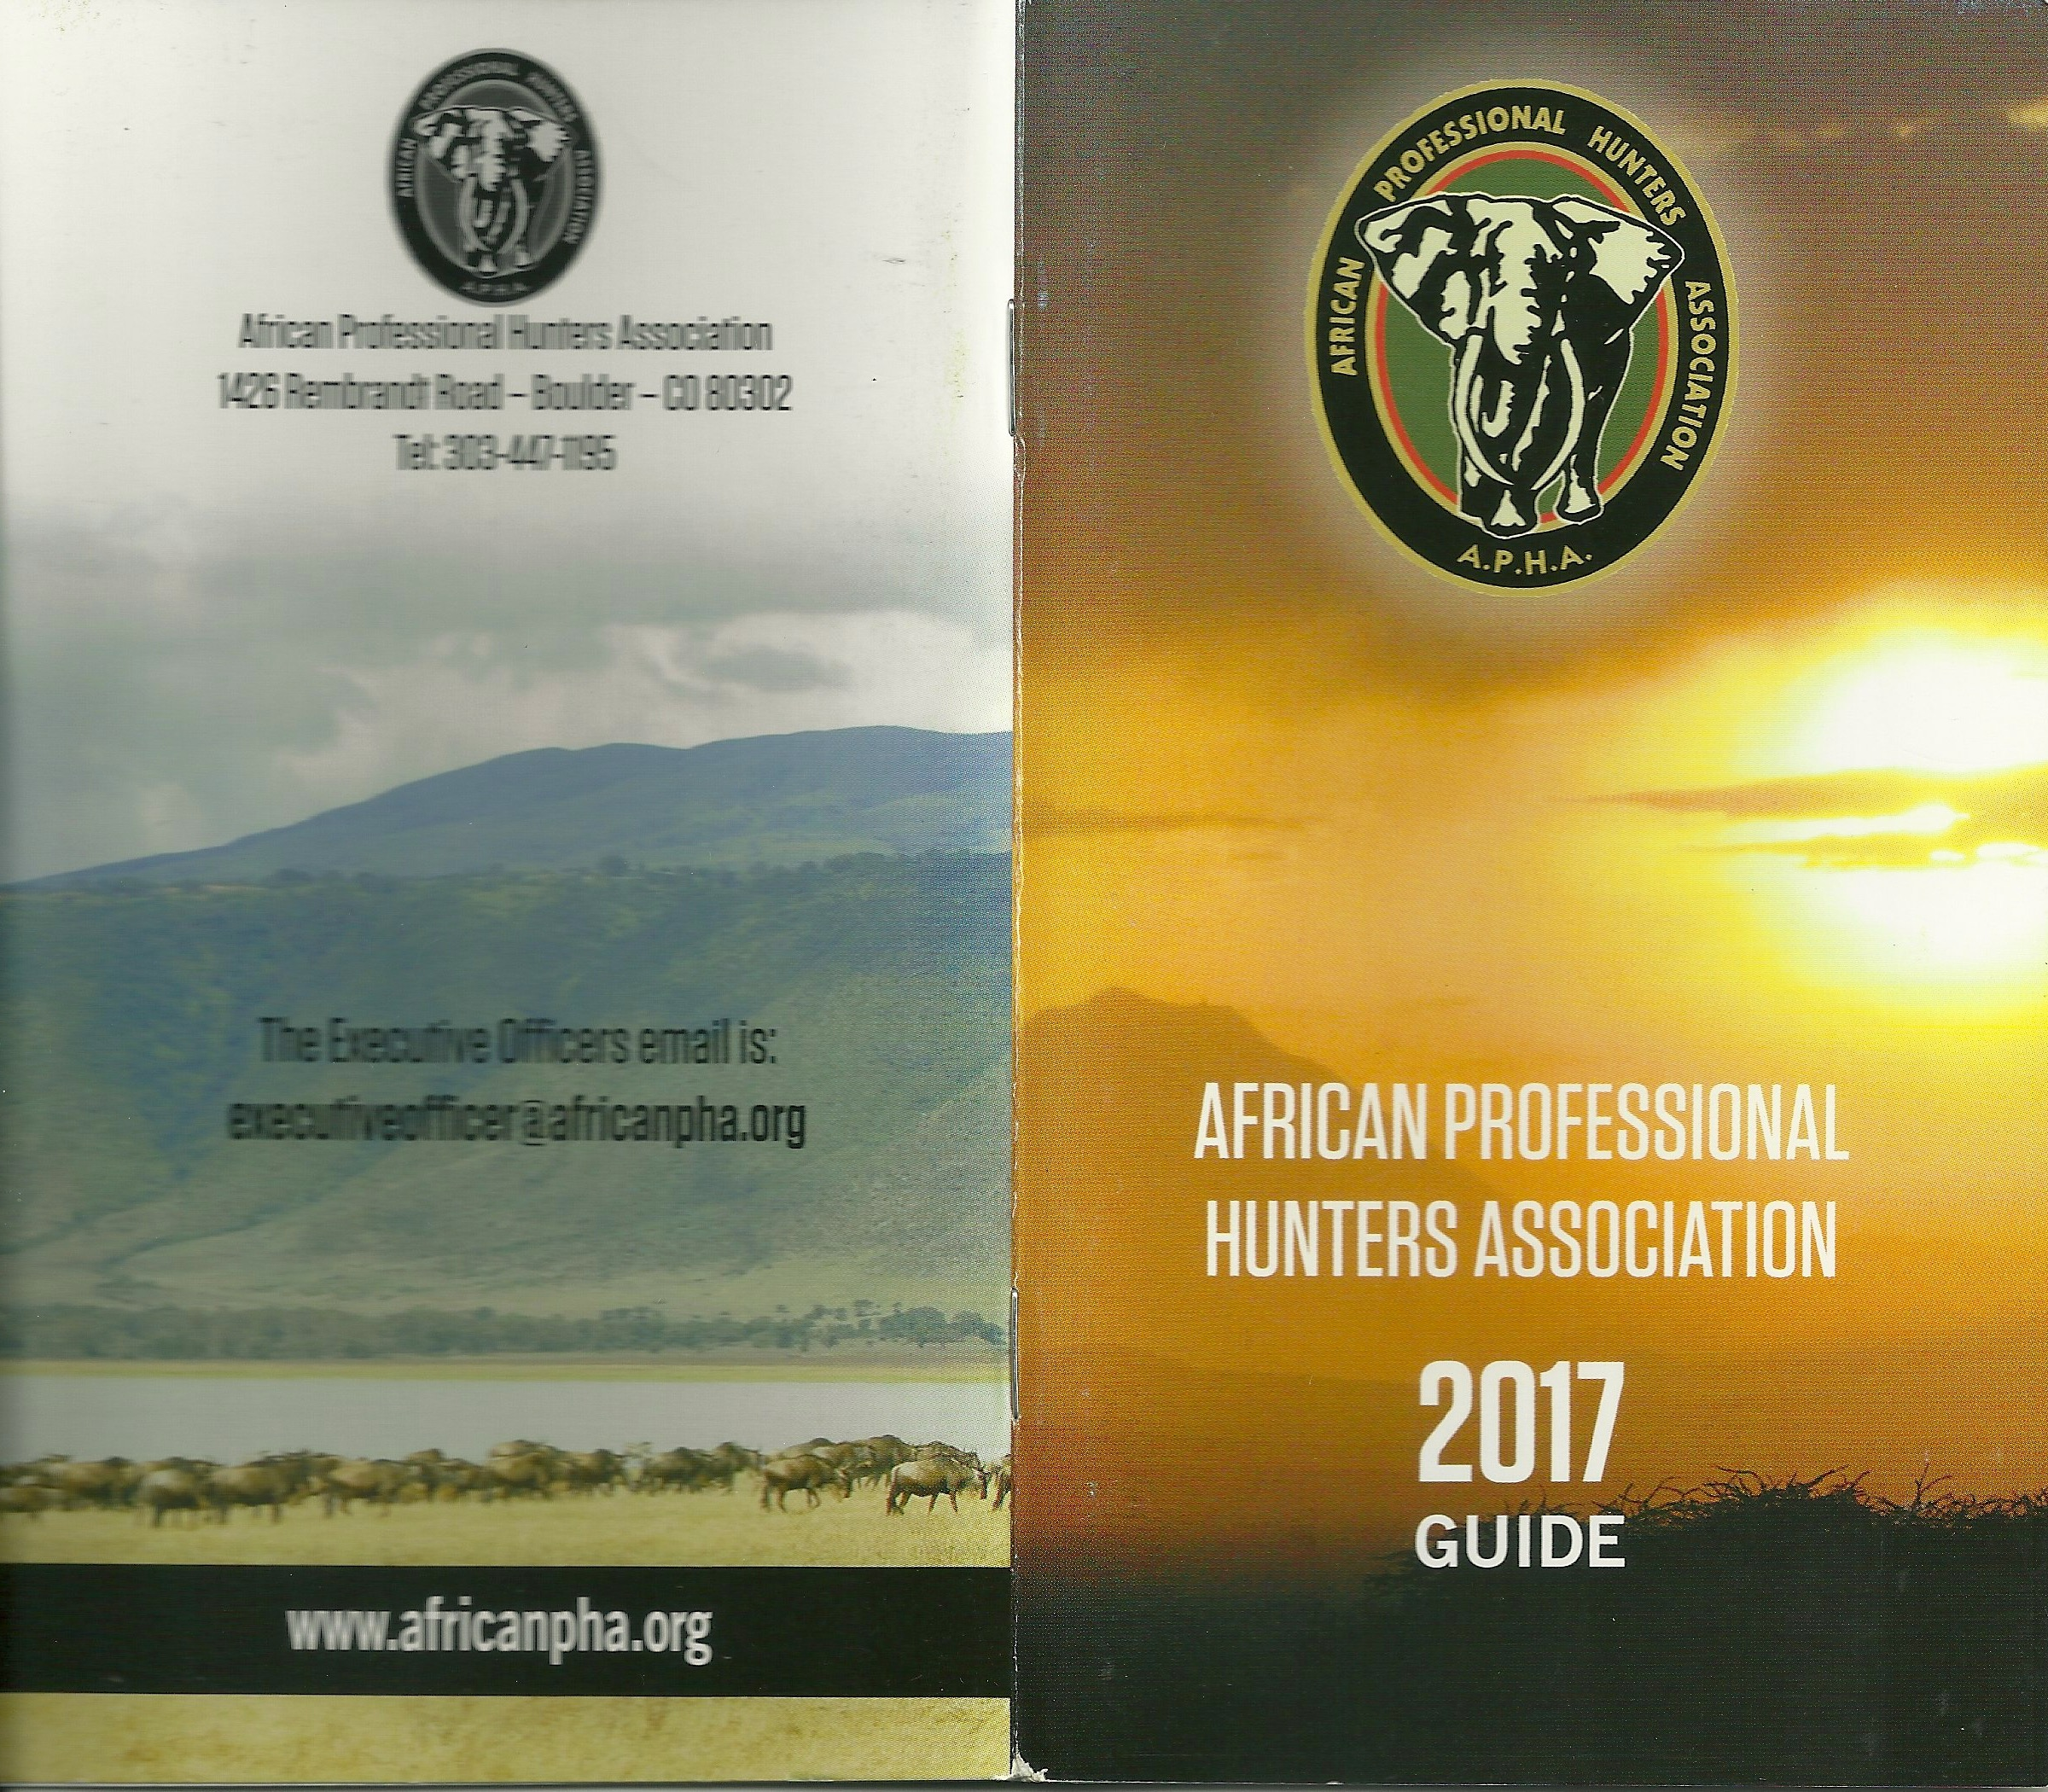 africa-professional-hunters-association.jpeg